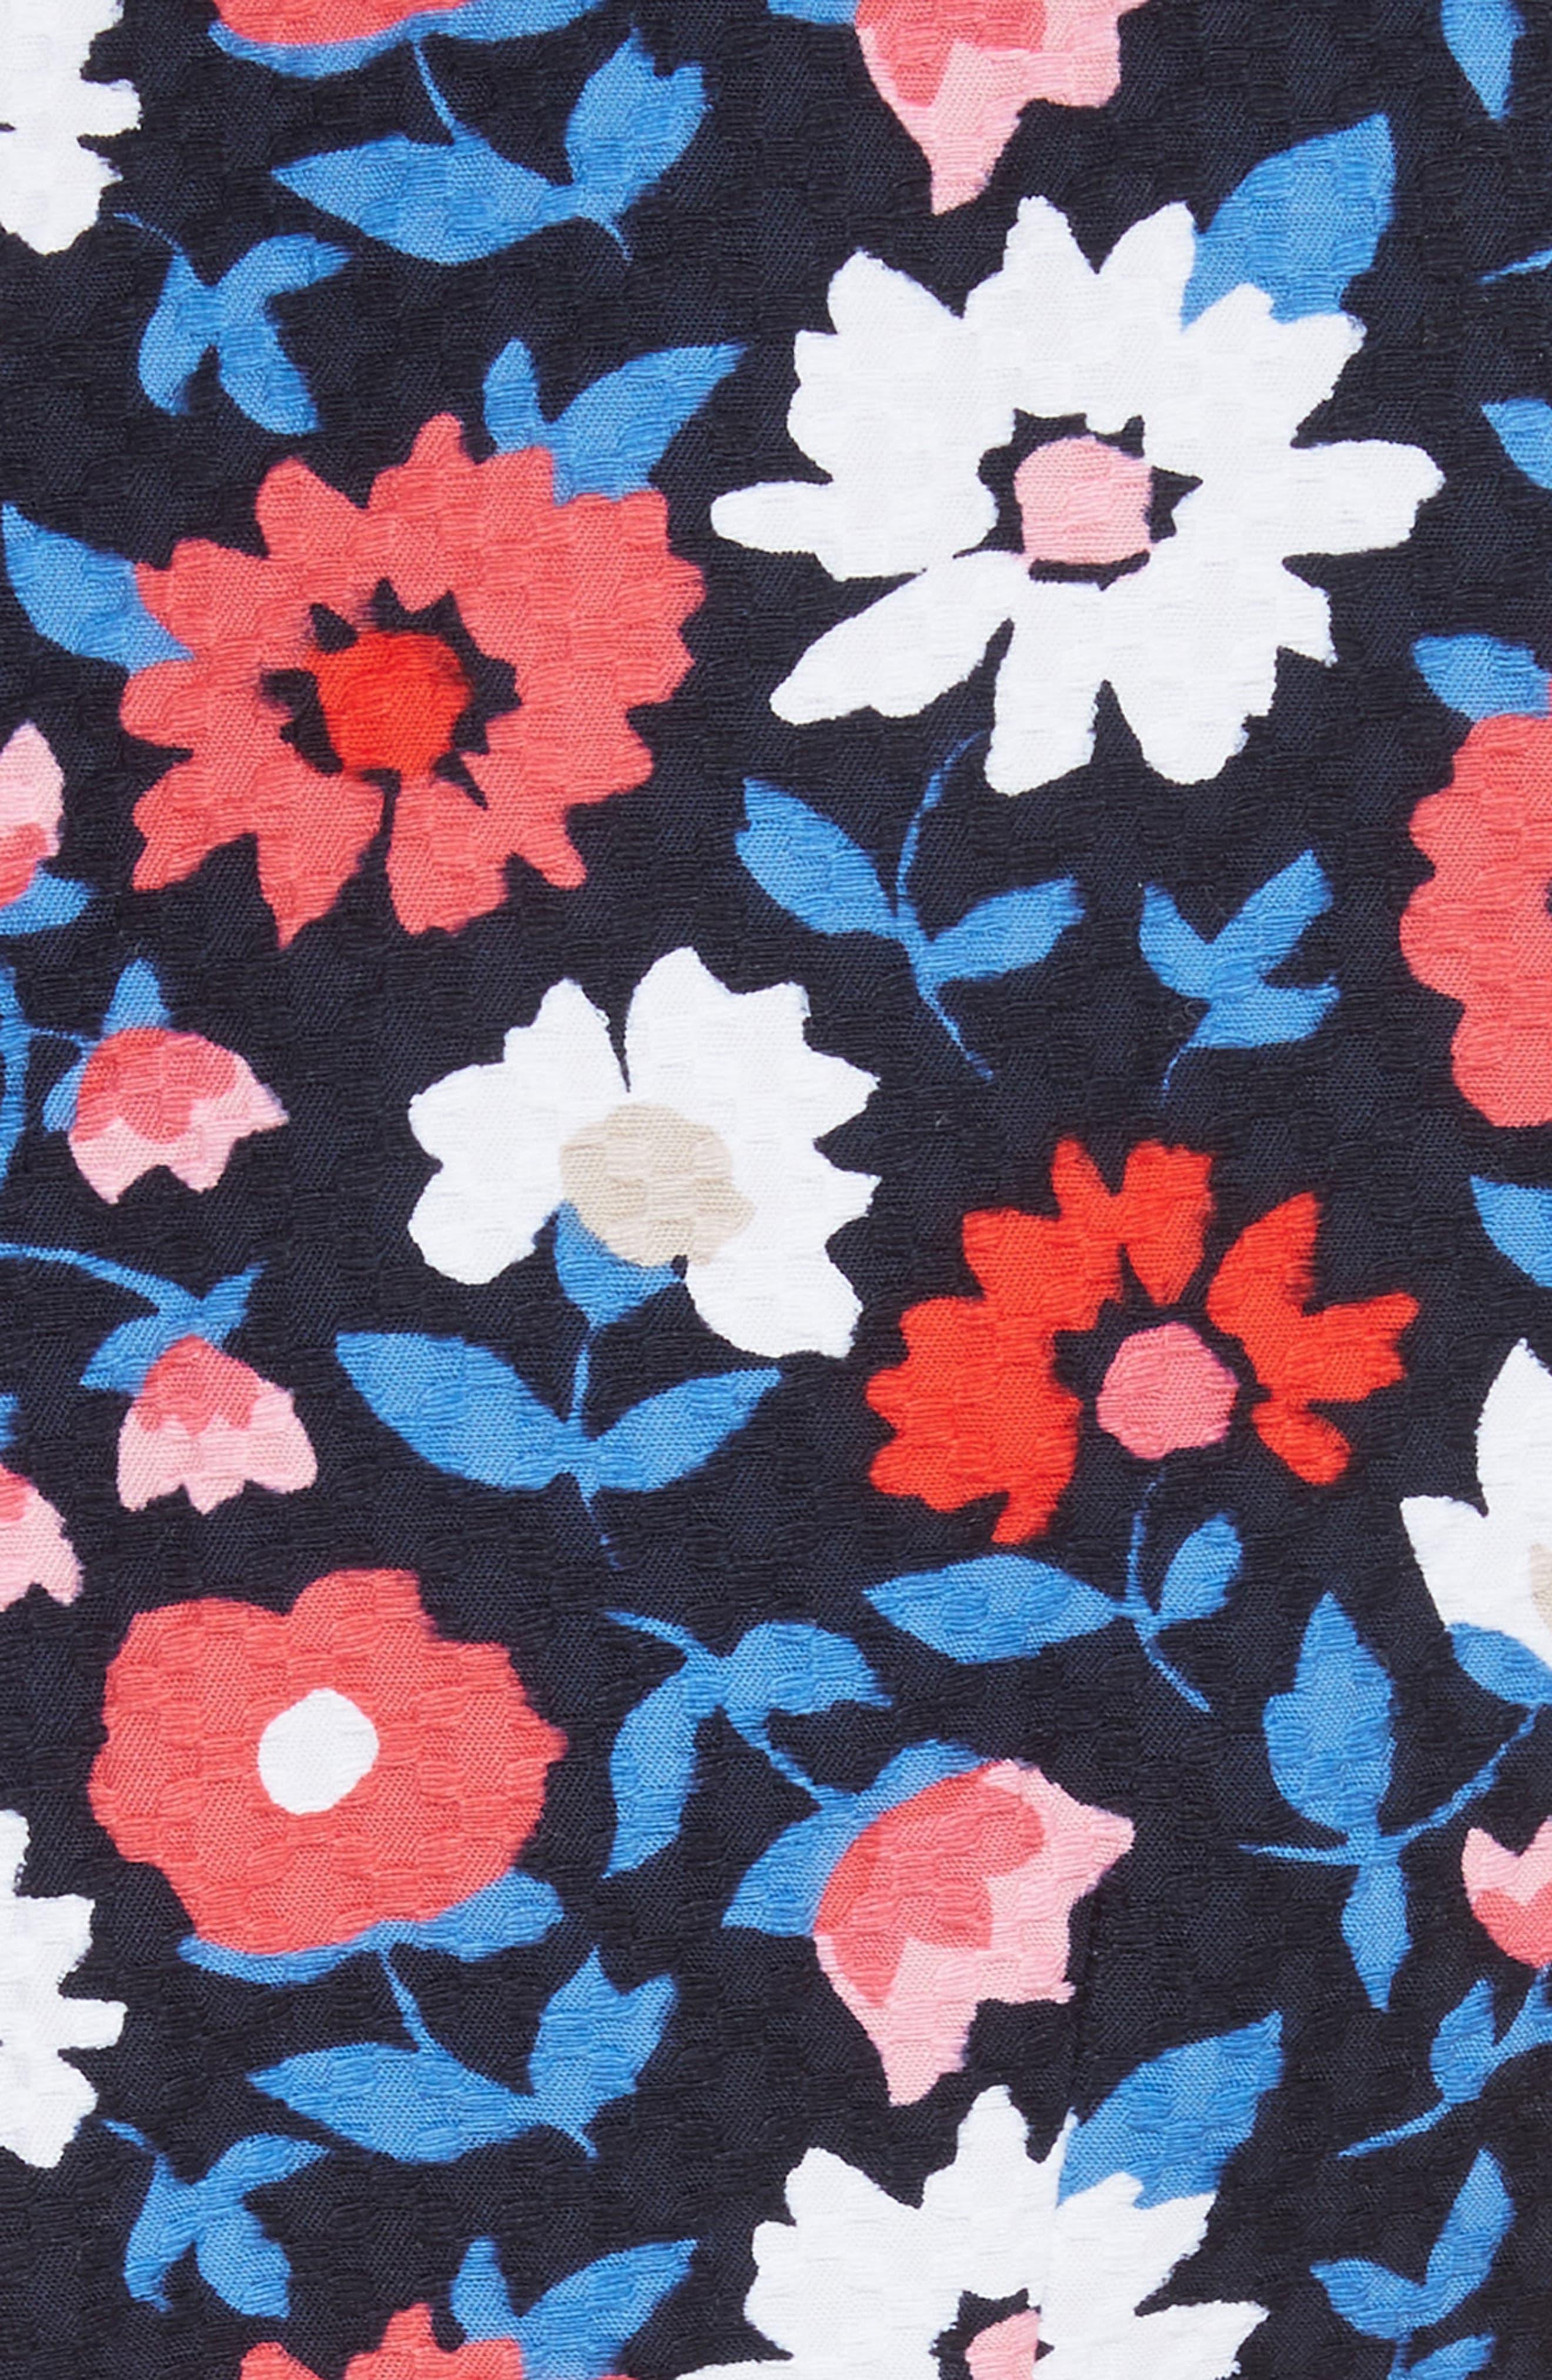 kate spade daisy jacquard sheath dress,                             Alternate thumbnail 5, color,